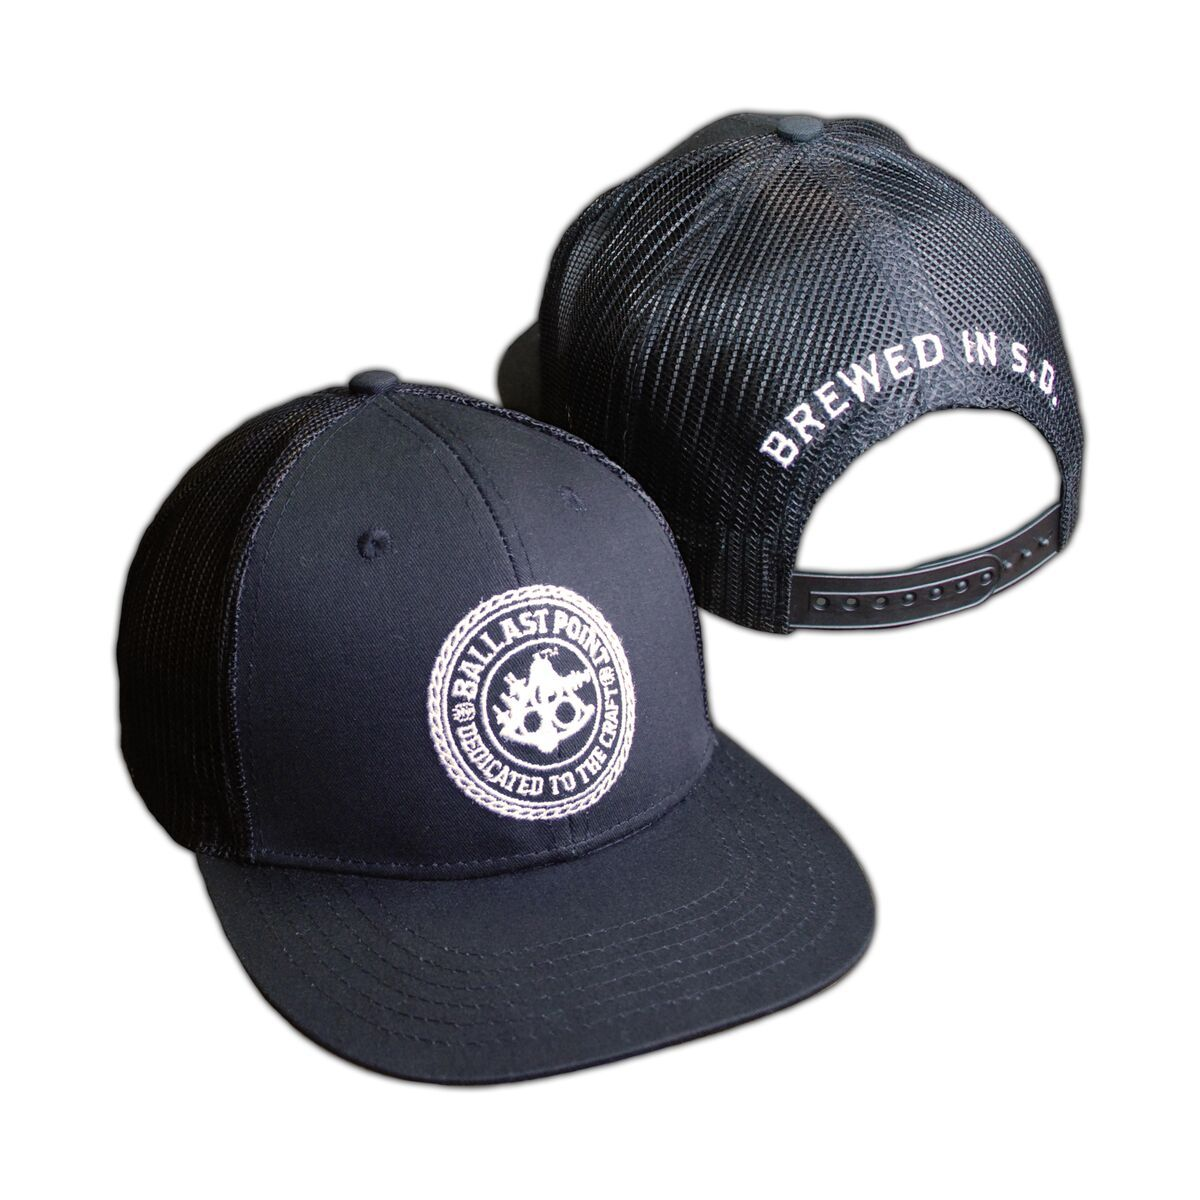 a91e956a8aa Ballast Point Snapback Trucker Hat Ballast Point